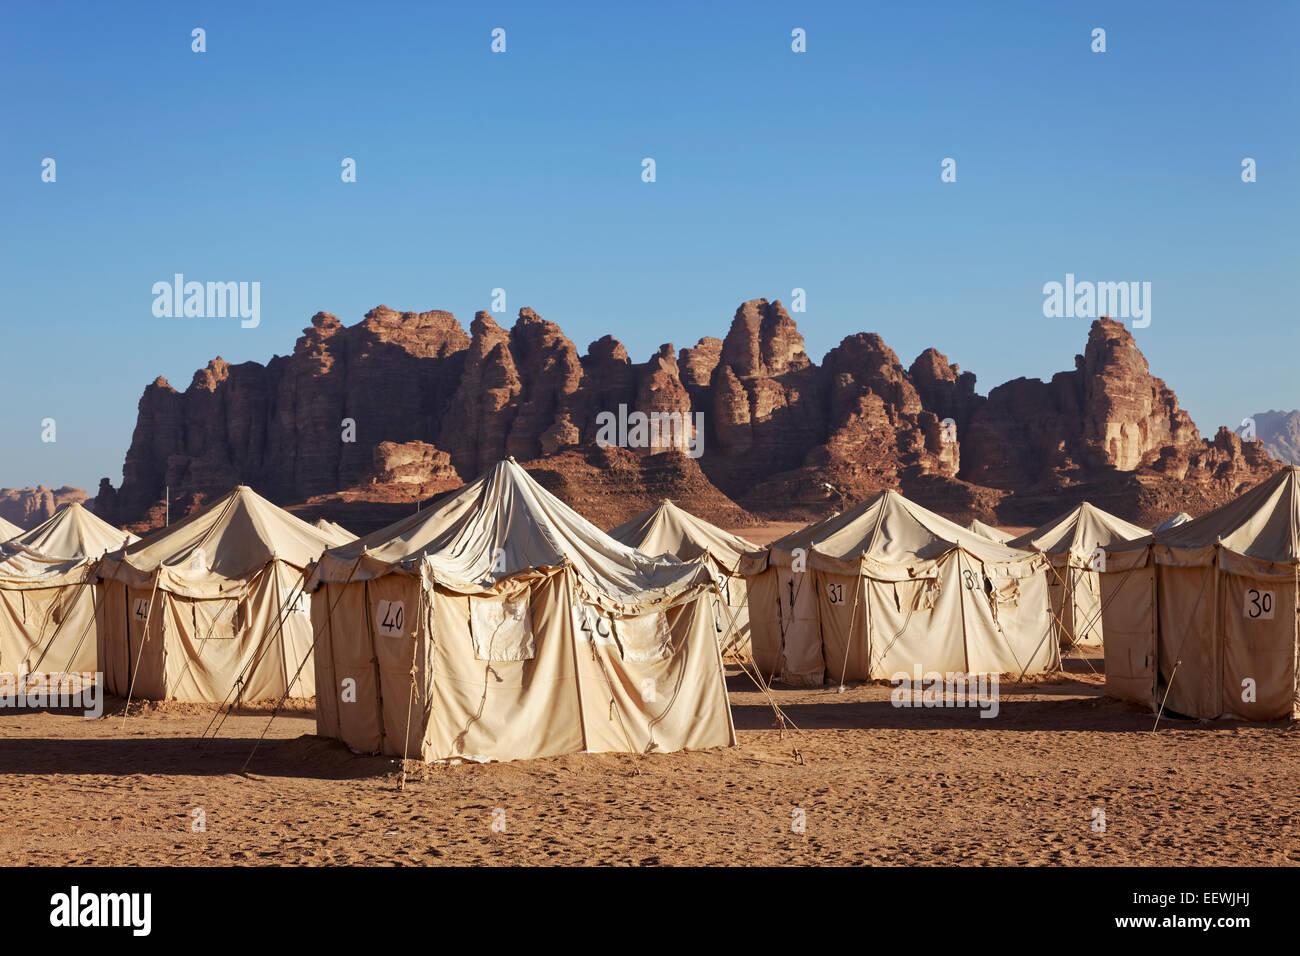 Tende, camp per turisti, montagne, Wadi Rum, Giordania Immagini Stock